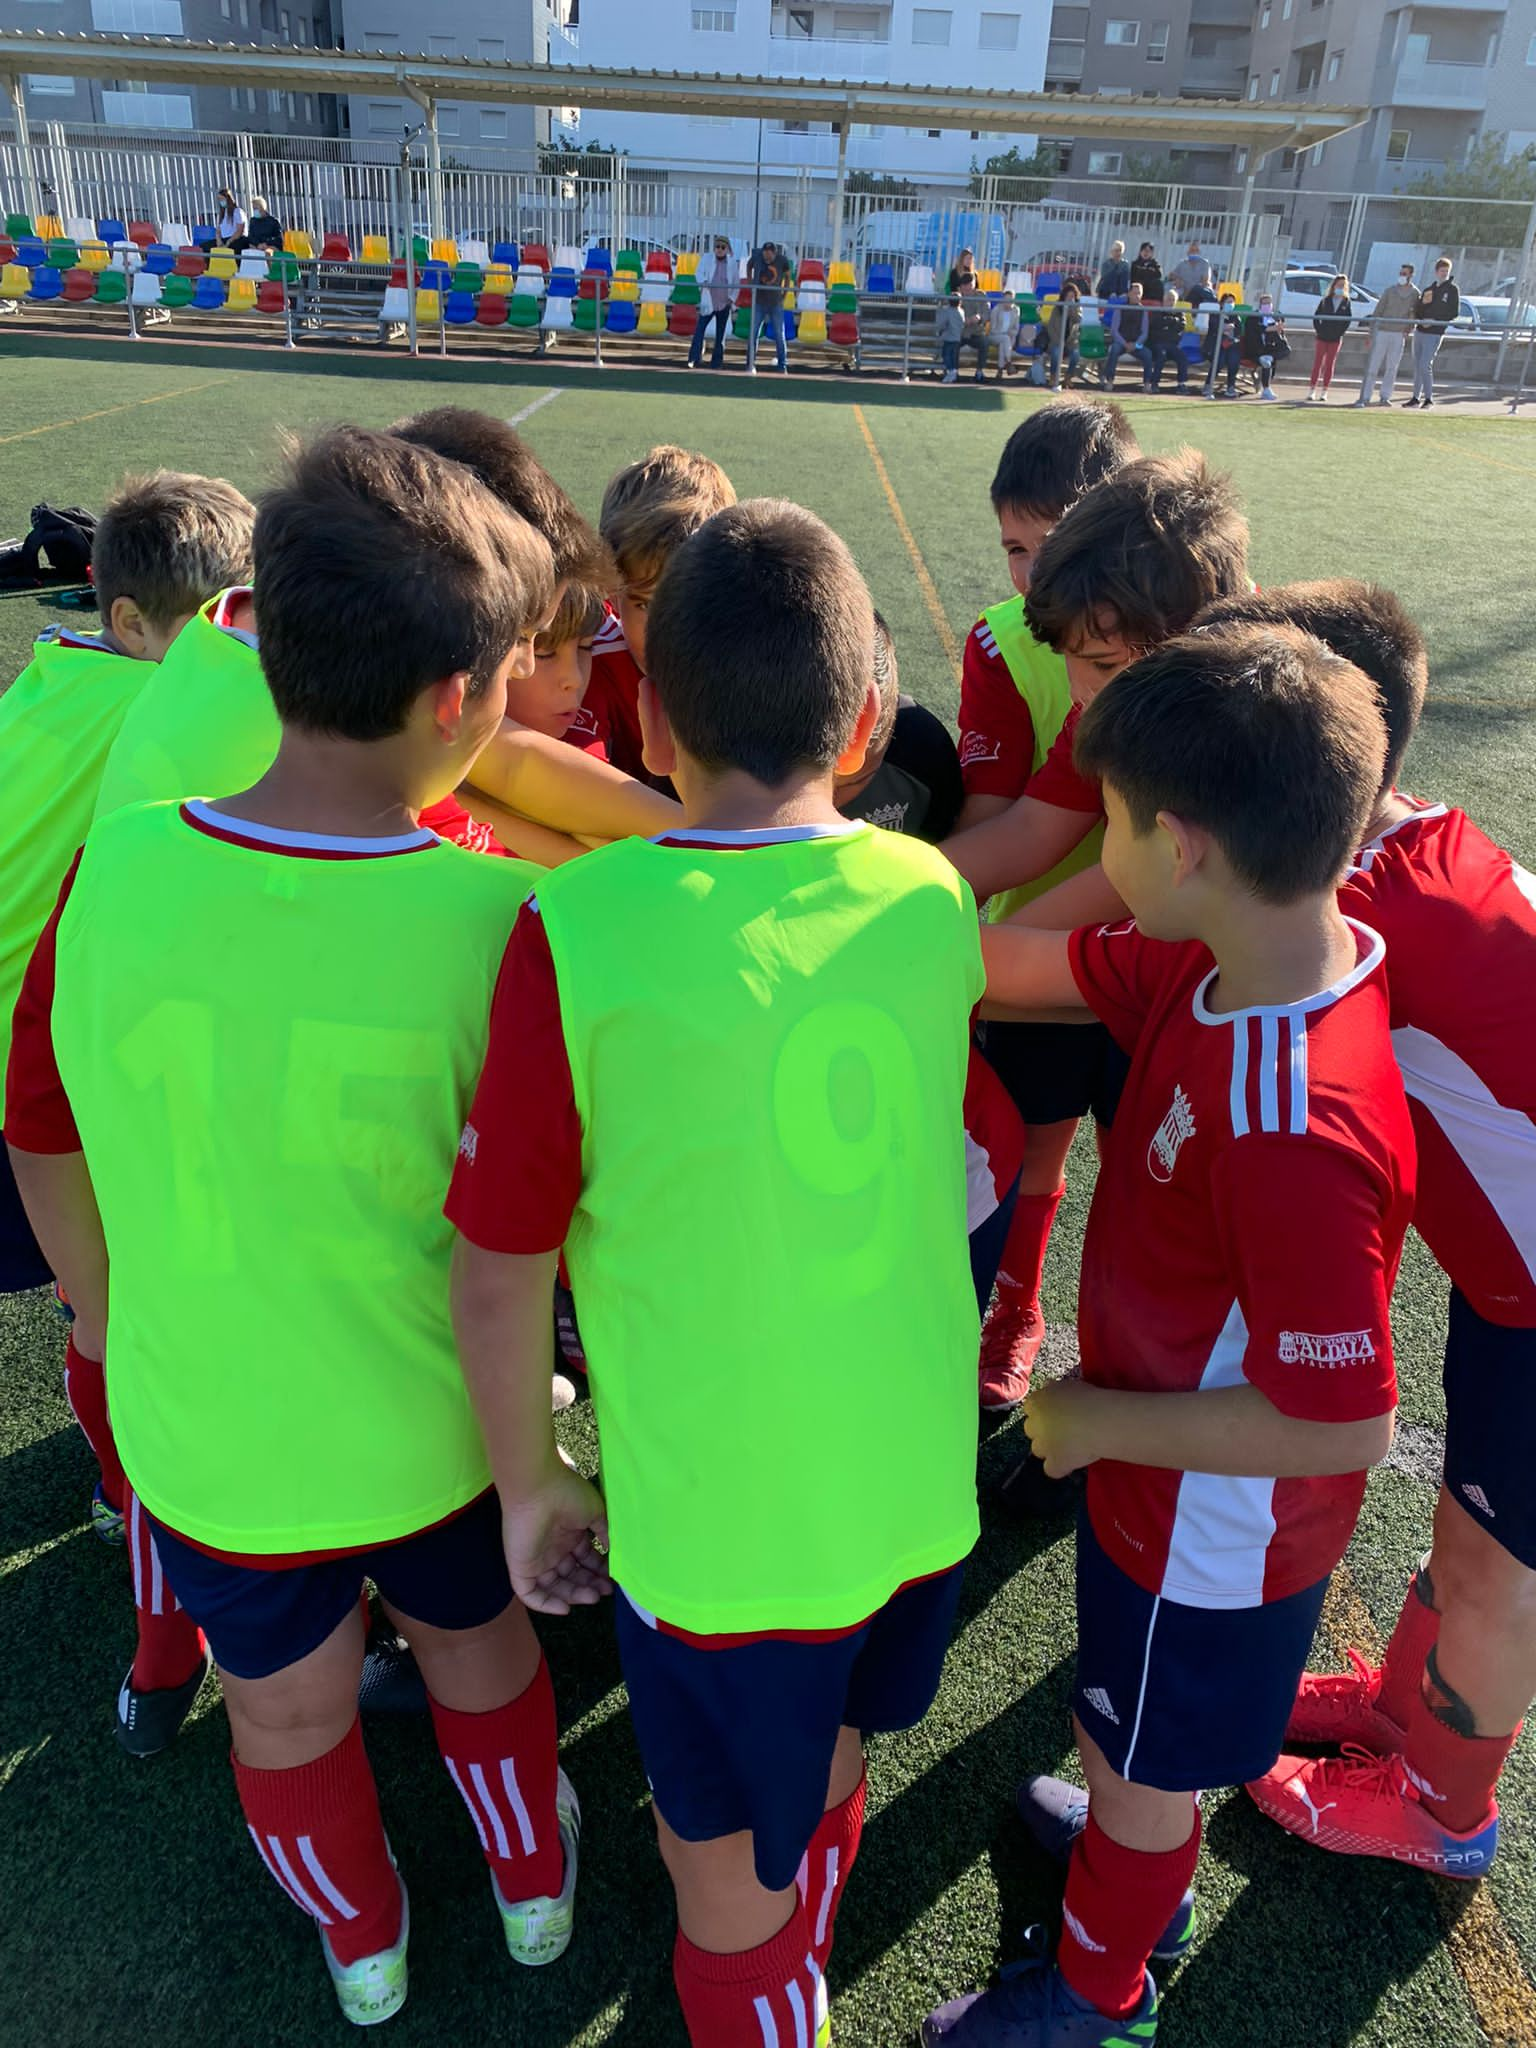 Fotos partidos equipos Escuela Fin de Semana 23-24 de Octubre.